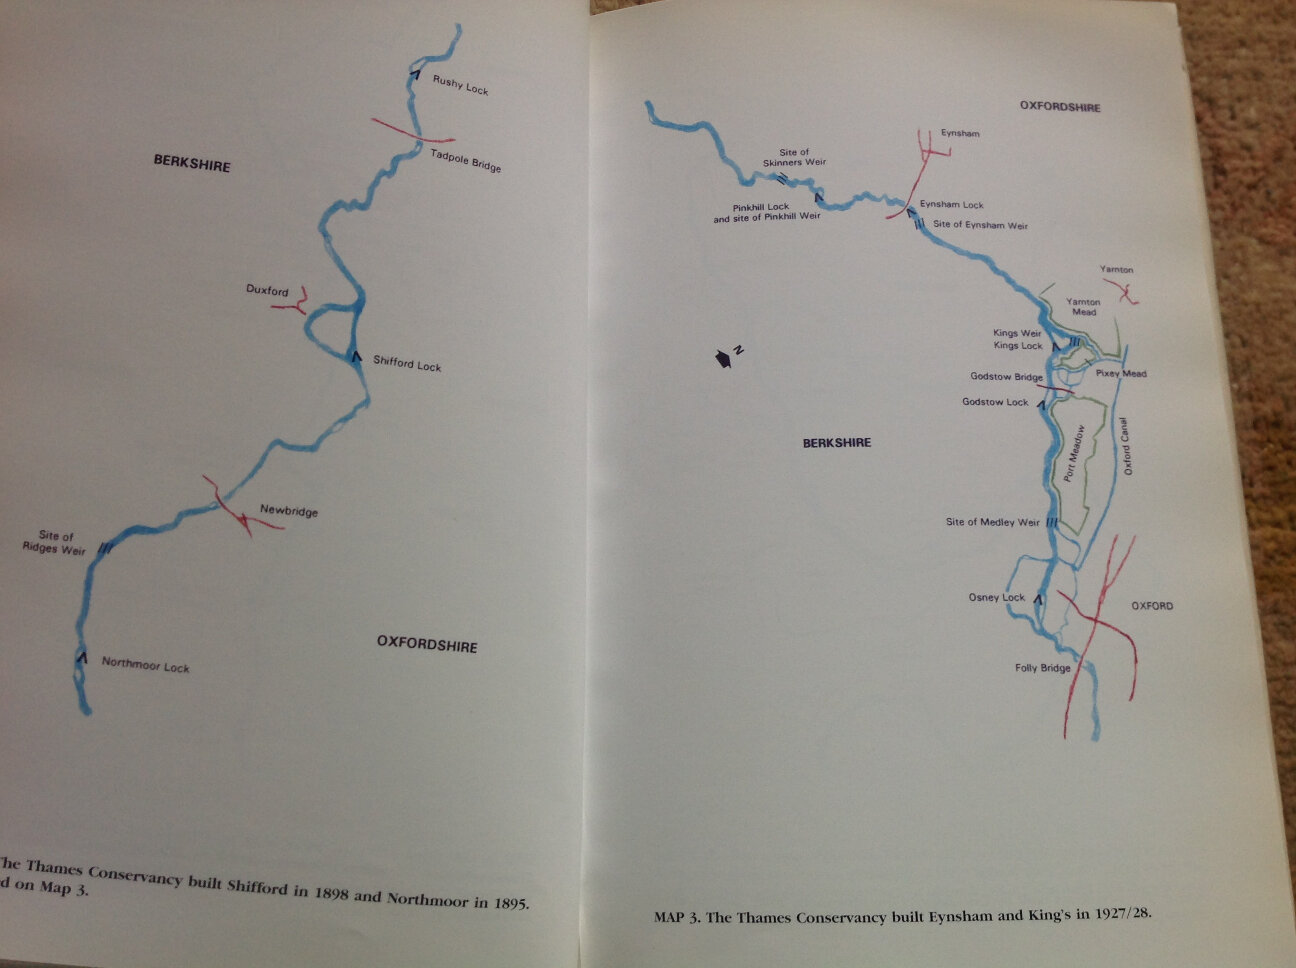 Newbridge to Oxford (35)